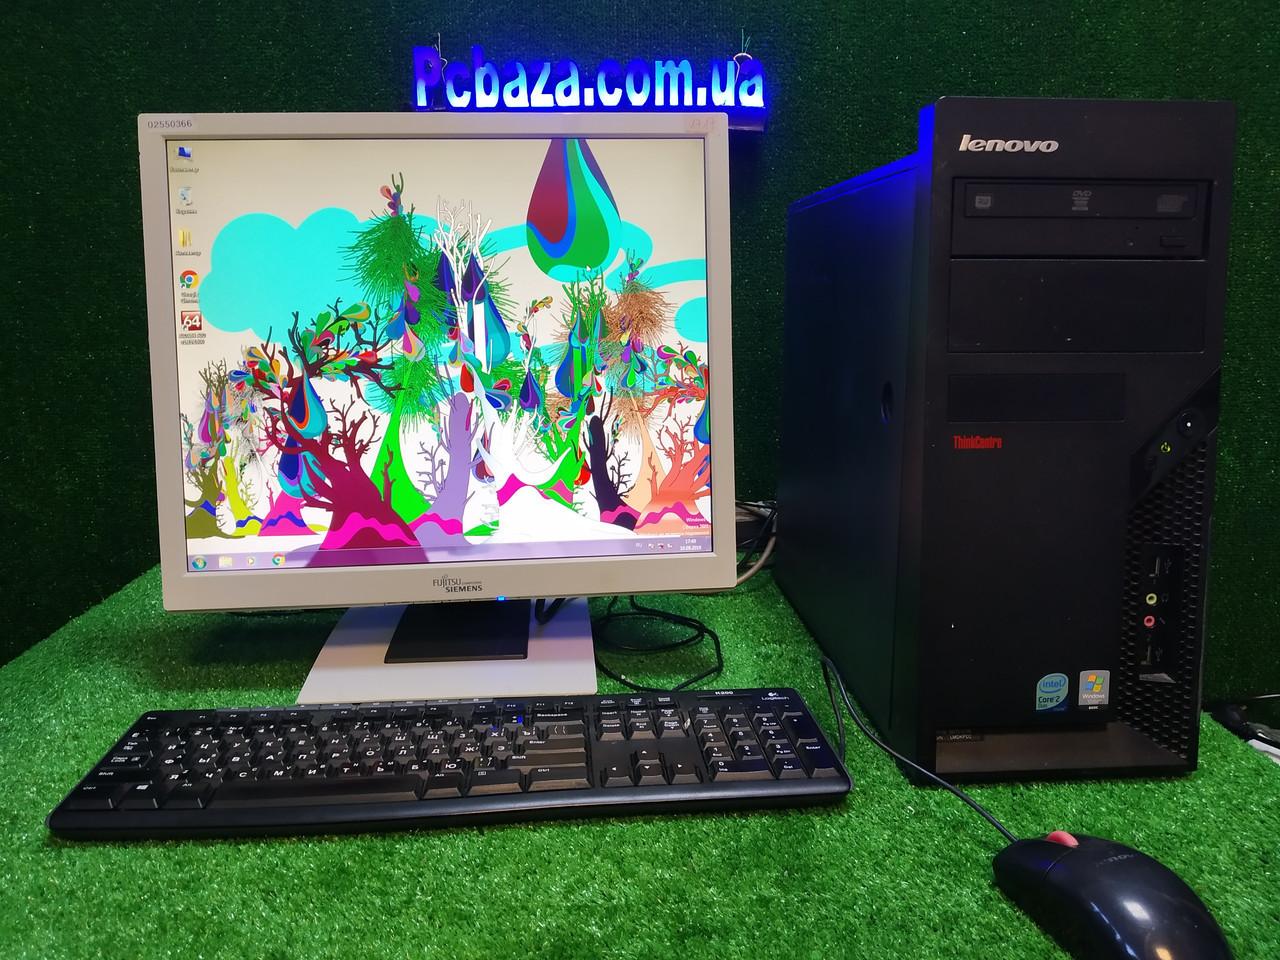 "Комплект Lenovo M55, 2 ядра, 4 ГБ ОЗУ, 500 Гб HDD + монитор 19"" Fujitsu ( со звуком! ), Полностью настроен!"